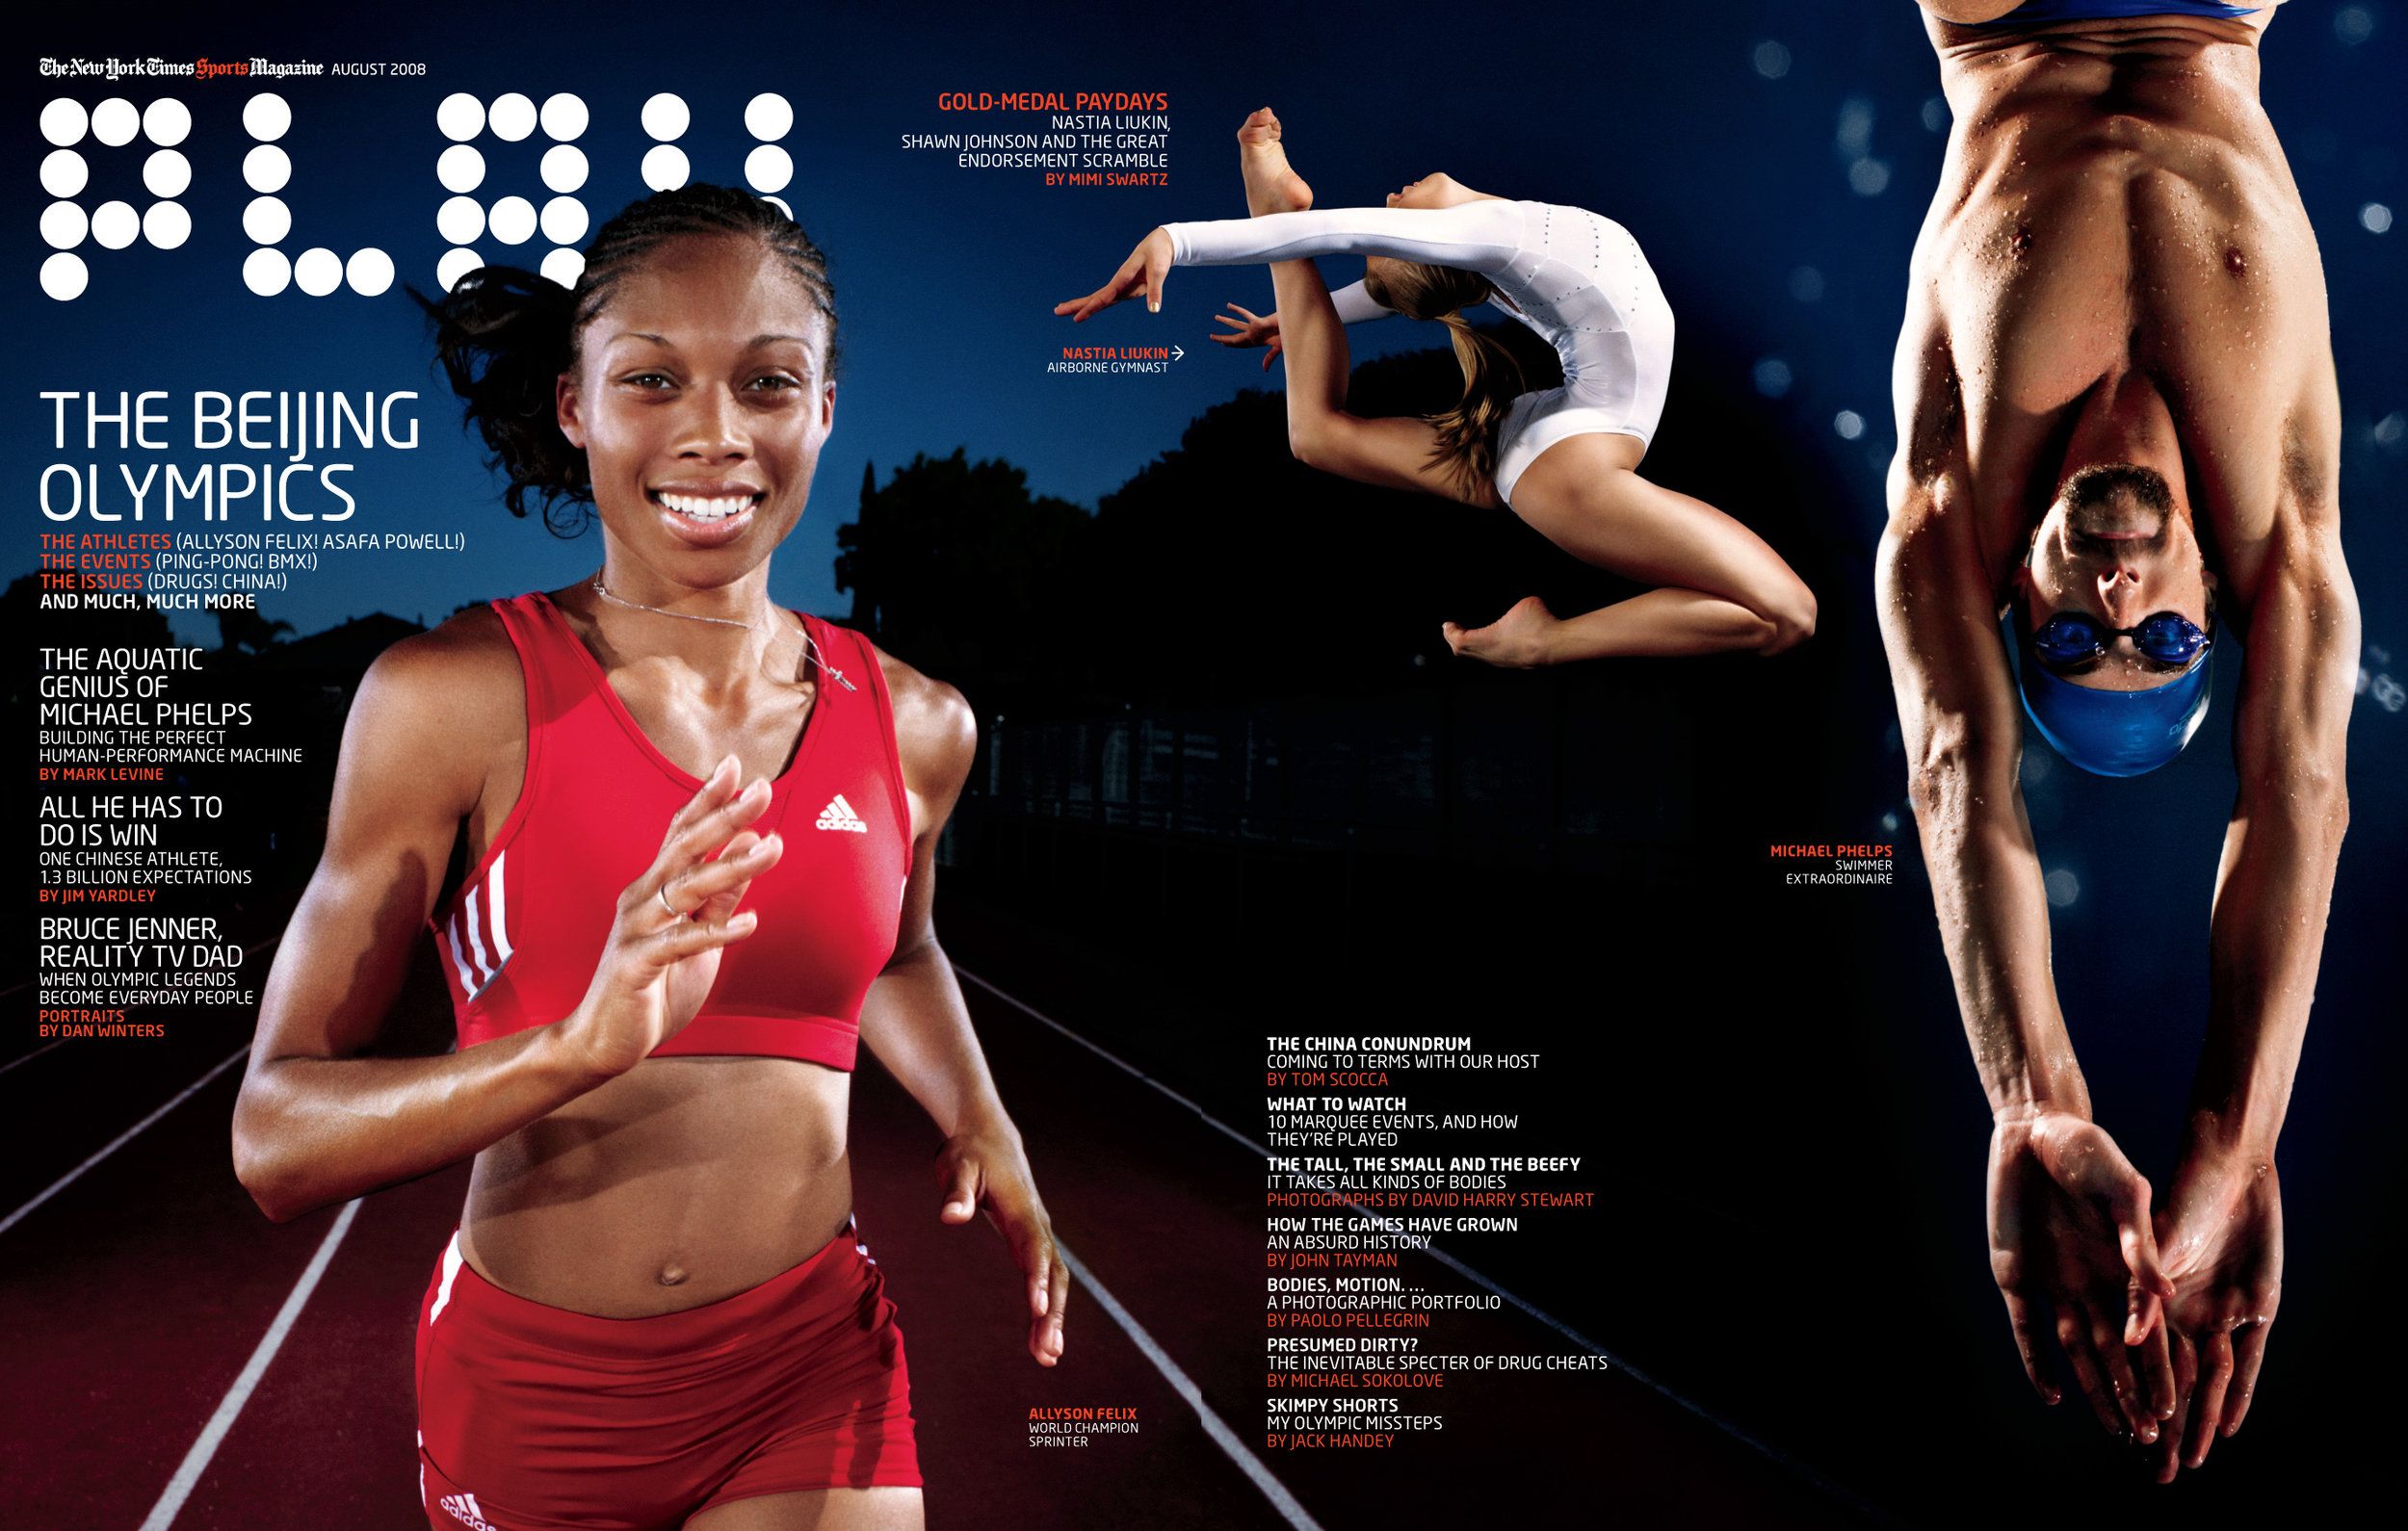 08.03.2008.Olympics.Cover.jpg